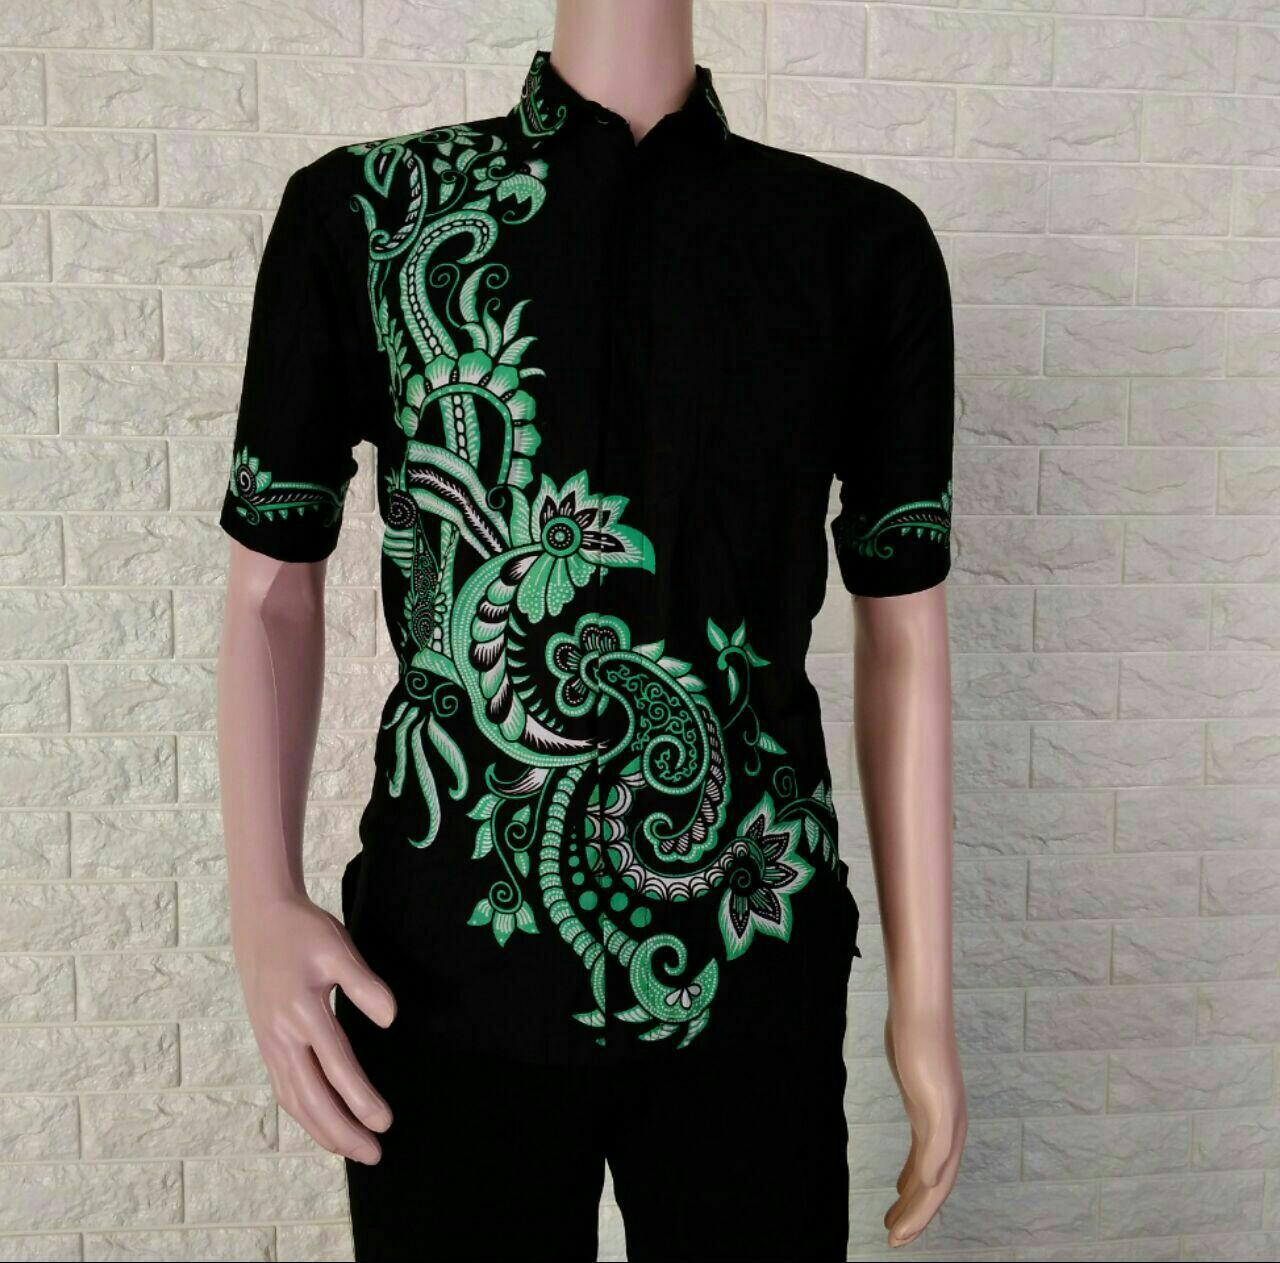 Jual Baju Batik Pria Baju Batik Modern Kemeja Batik Pekalongan Hem Batik Kemeja Motif Arjuna Hitam